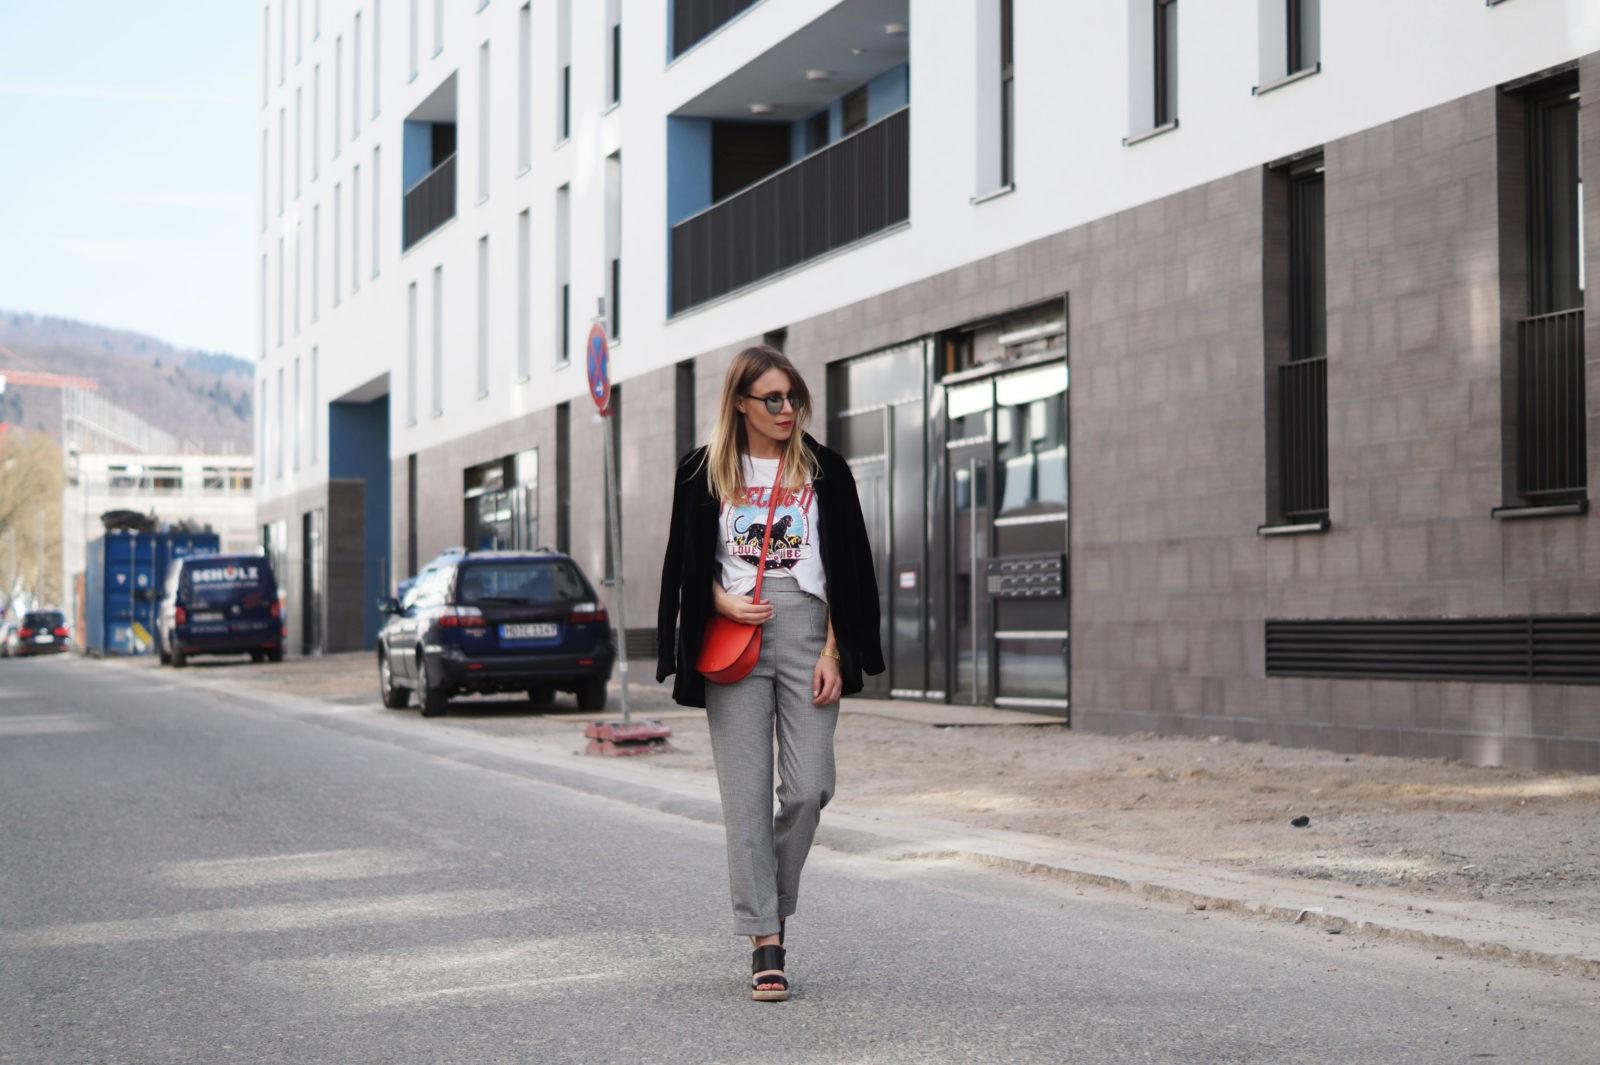 Slogan Shirt Pop of Red Outfit Fashionblogger Sariety Modeblog Heidelberg Bandshirt Karohose rote Tasche Mirrored Sunglasses Plaid Slacks